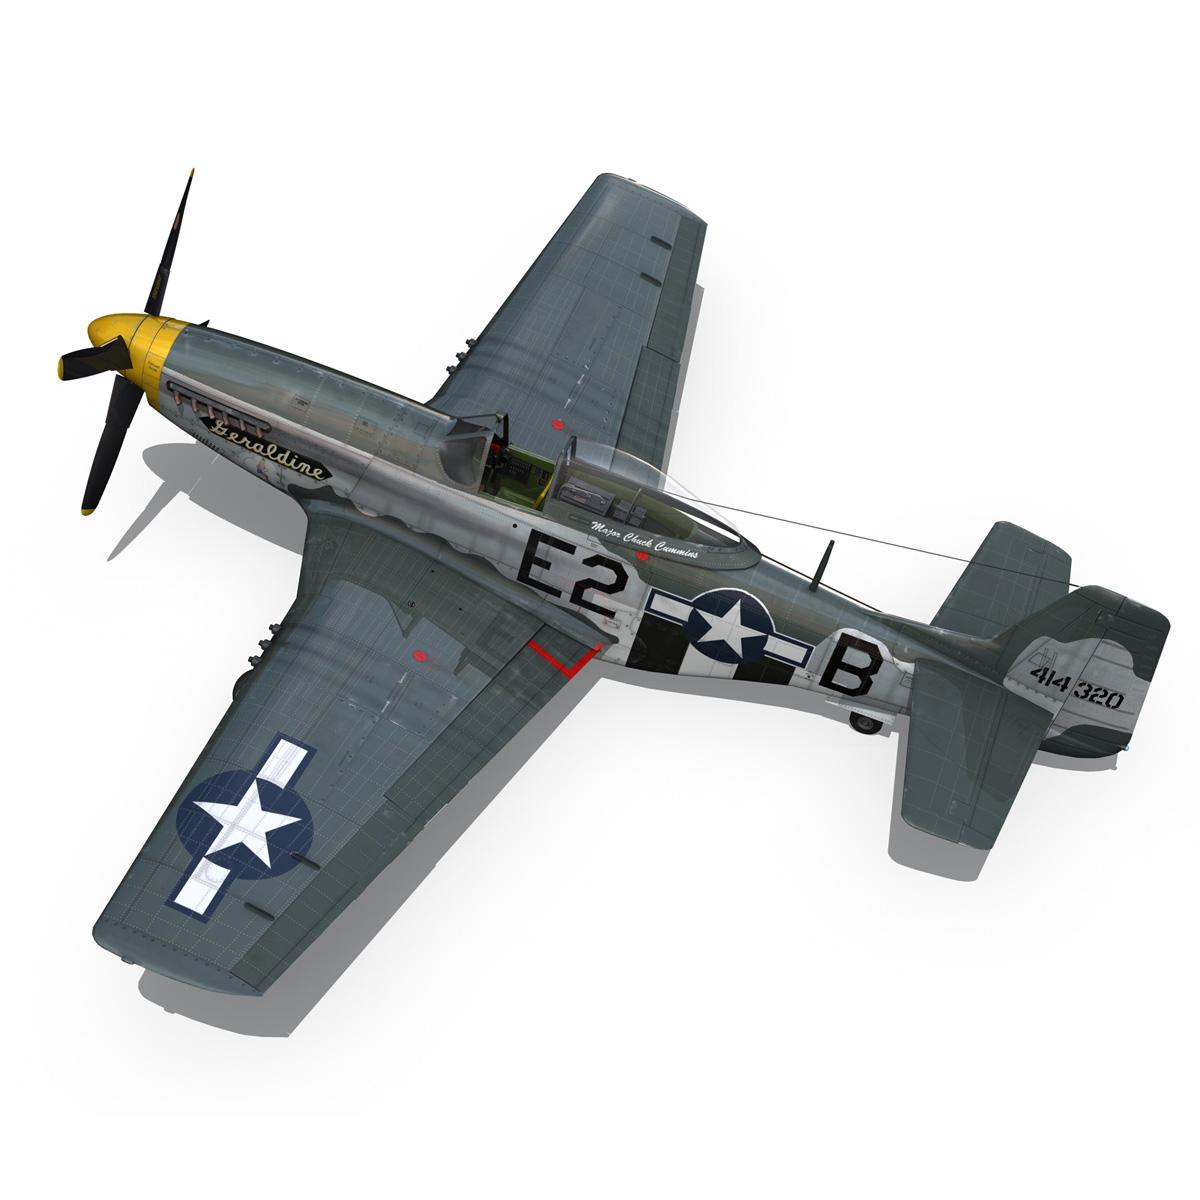 North American P-51D - Geraldine 3d model fbx c4d lwo obj 265947